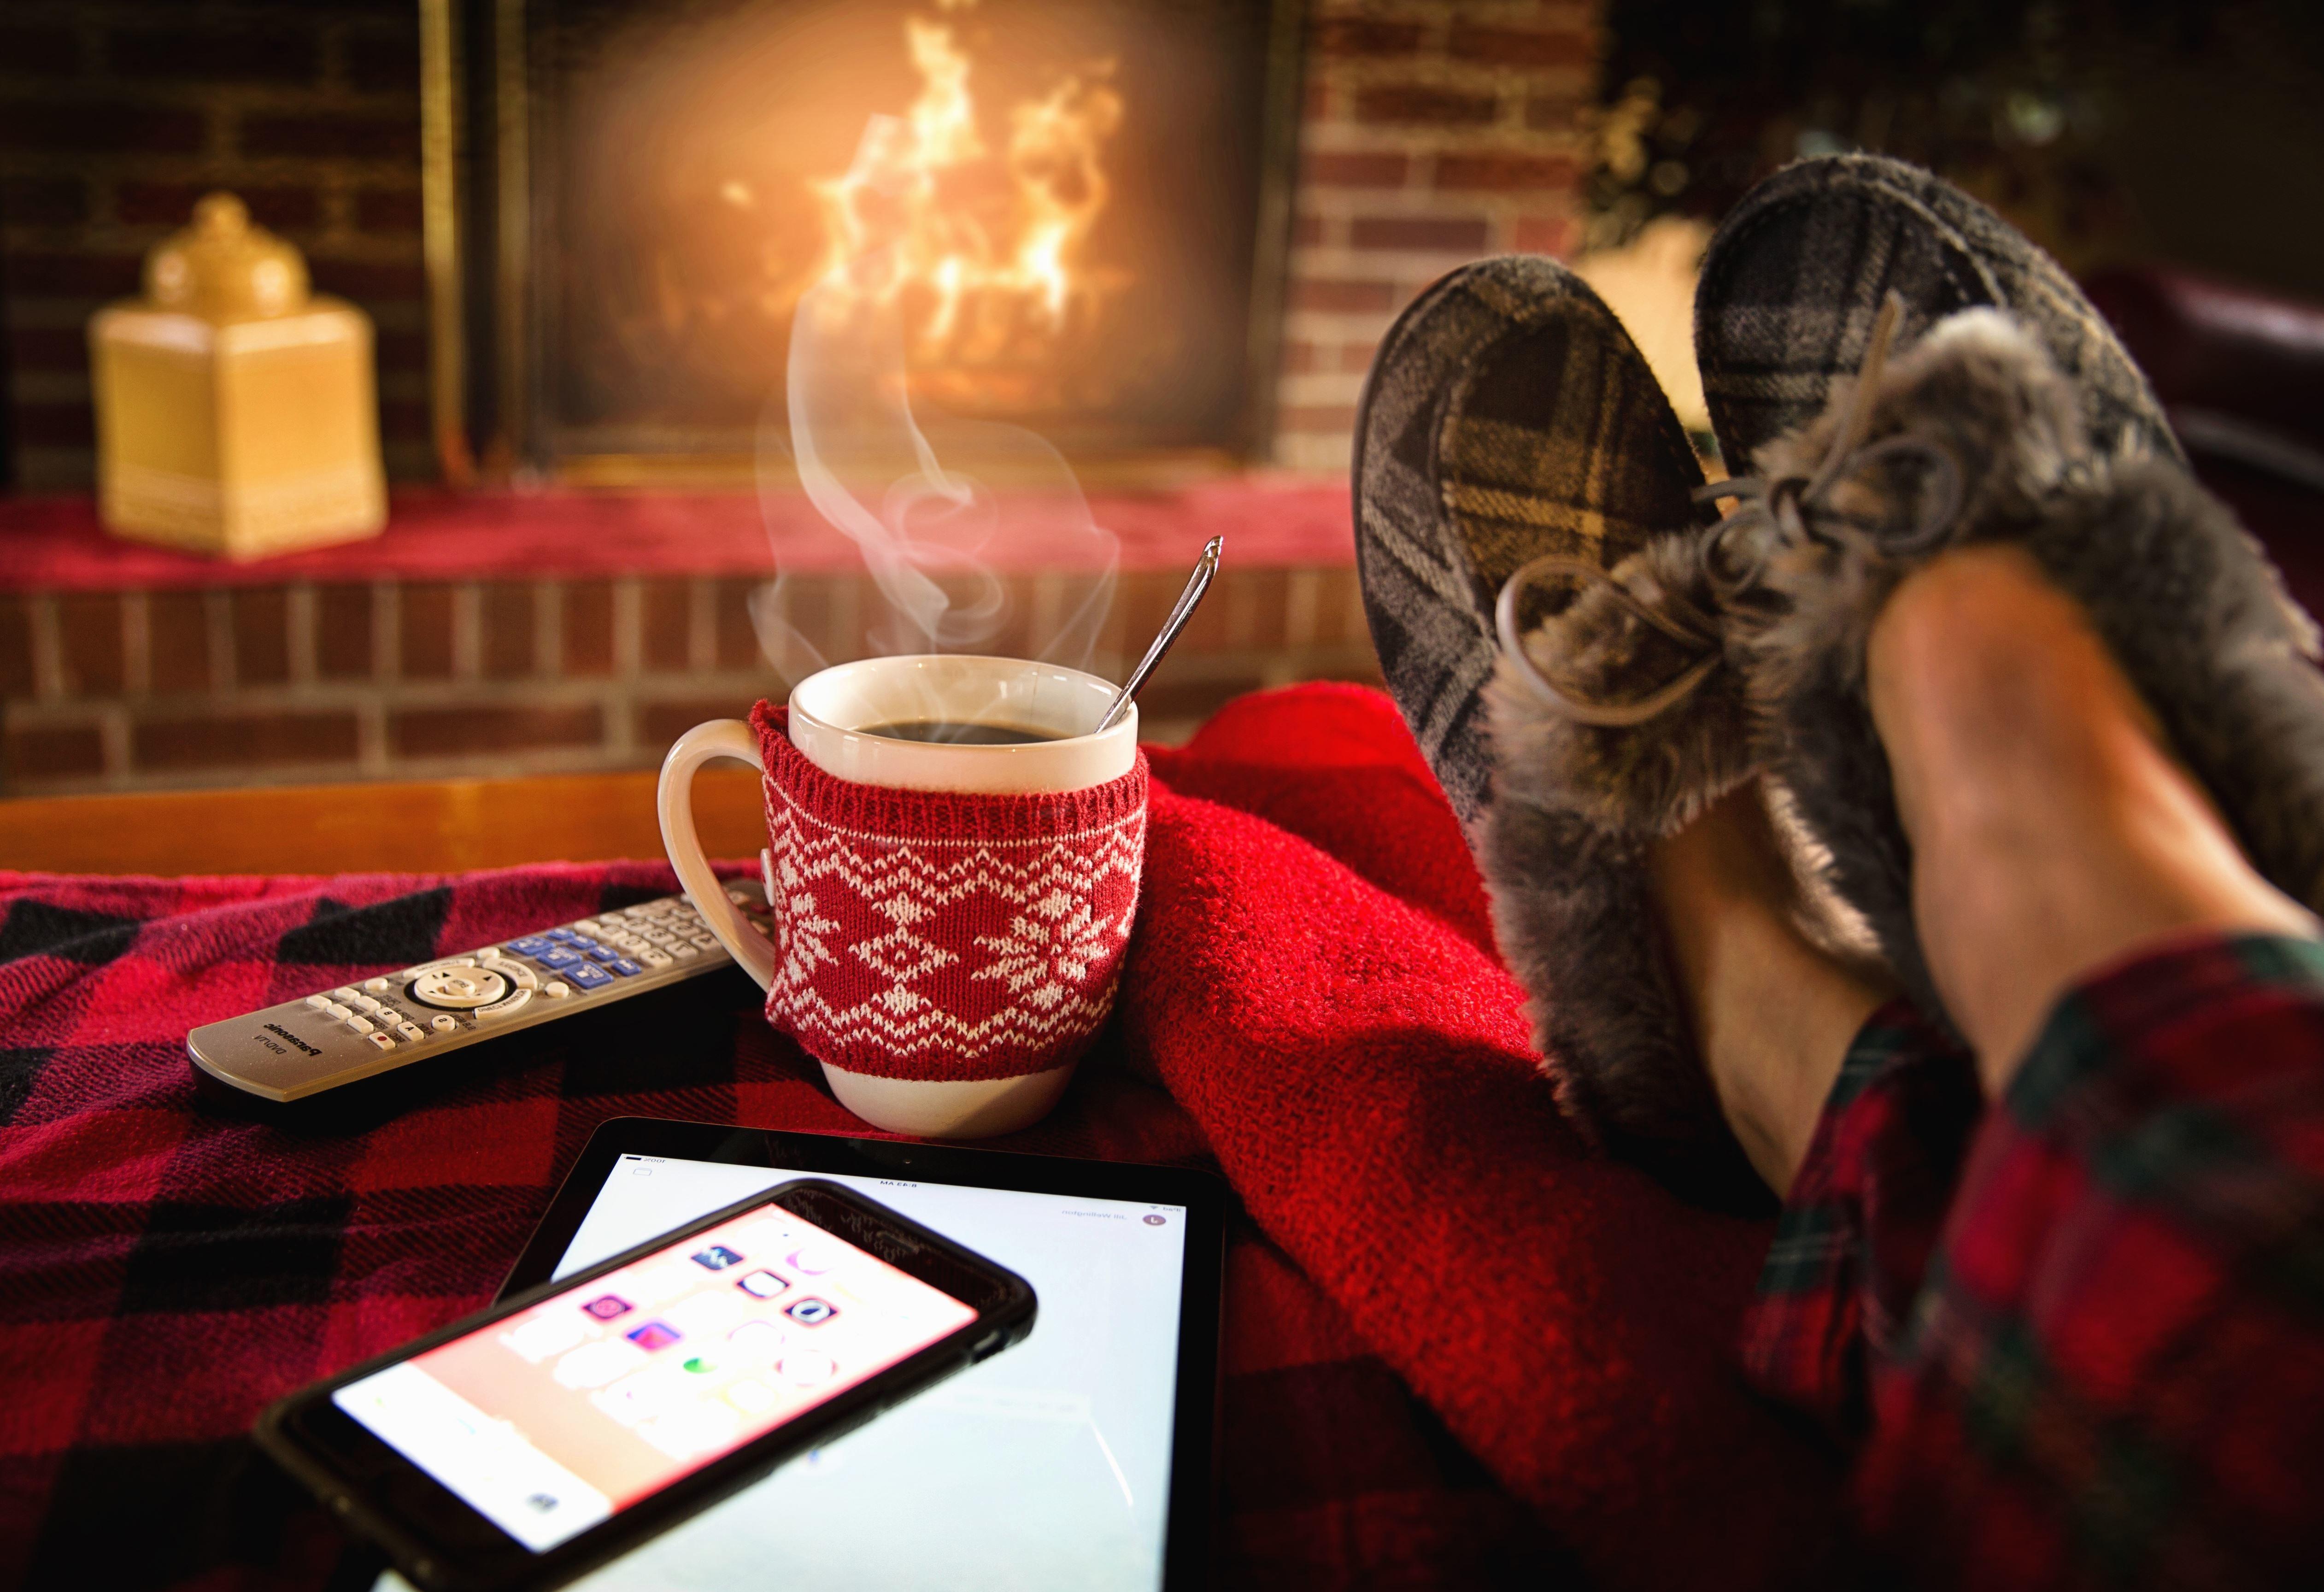 Image libre Smartphone maison chemine flamme